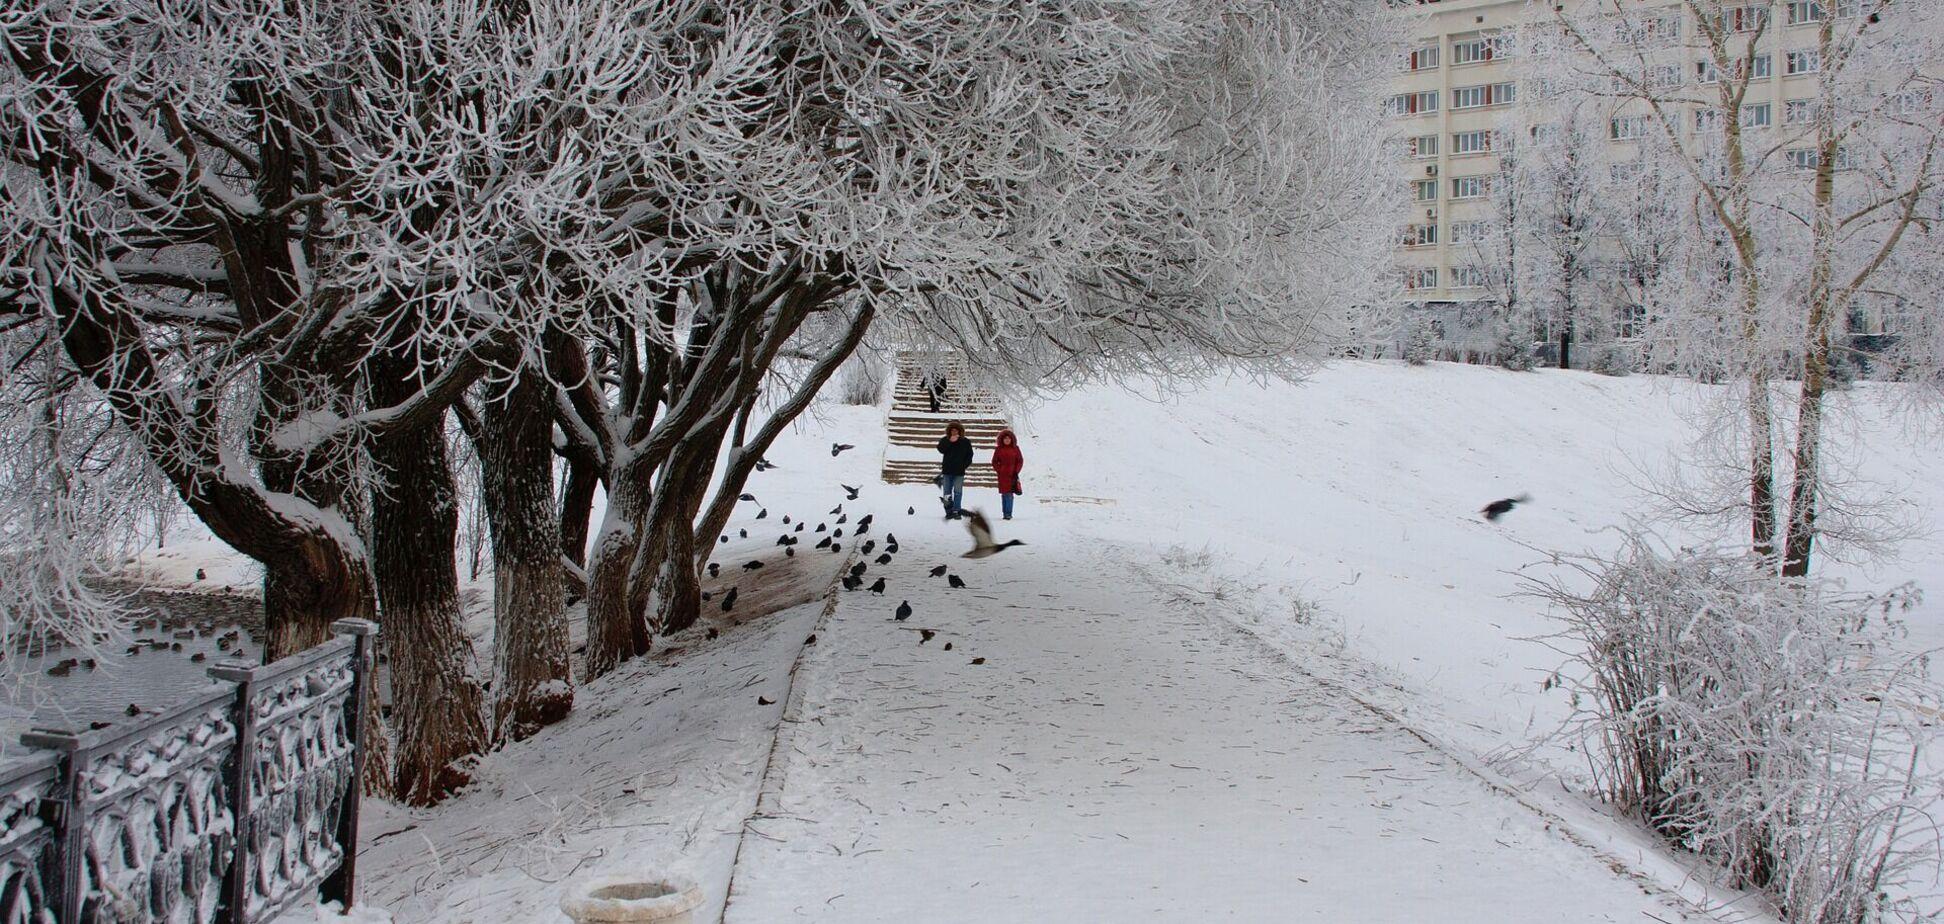 Мороз 18 января охватит всю Украину